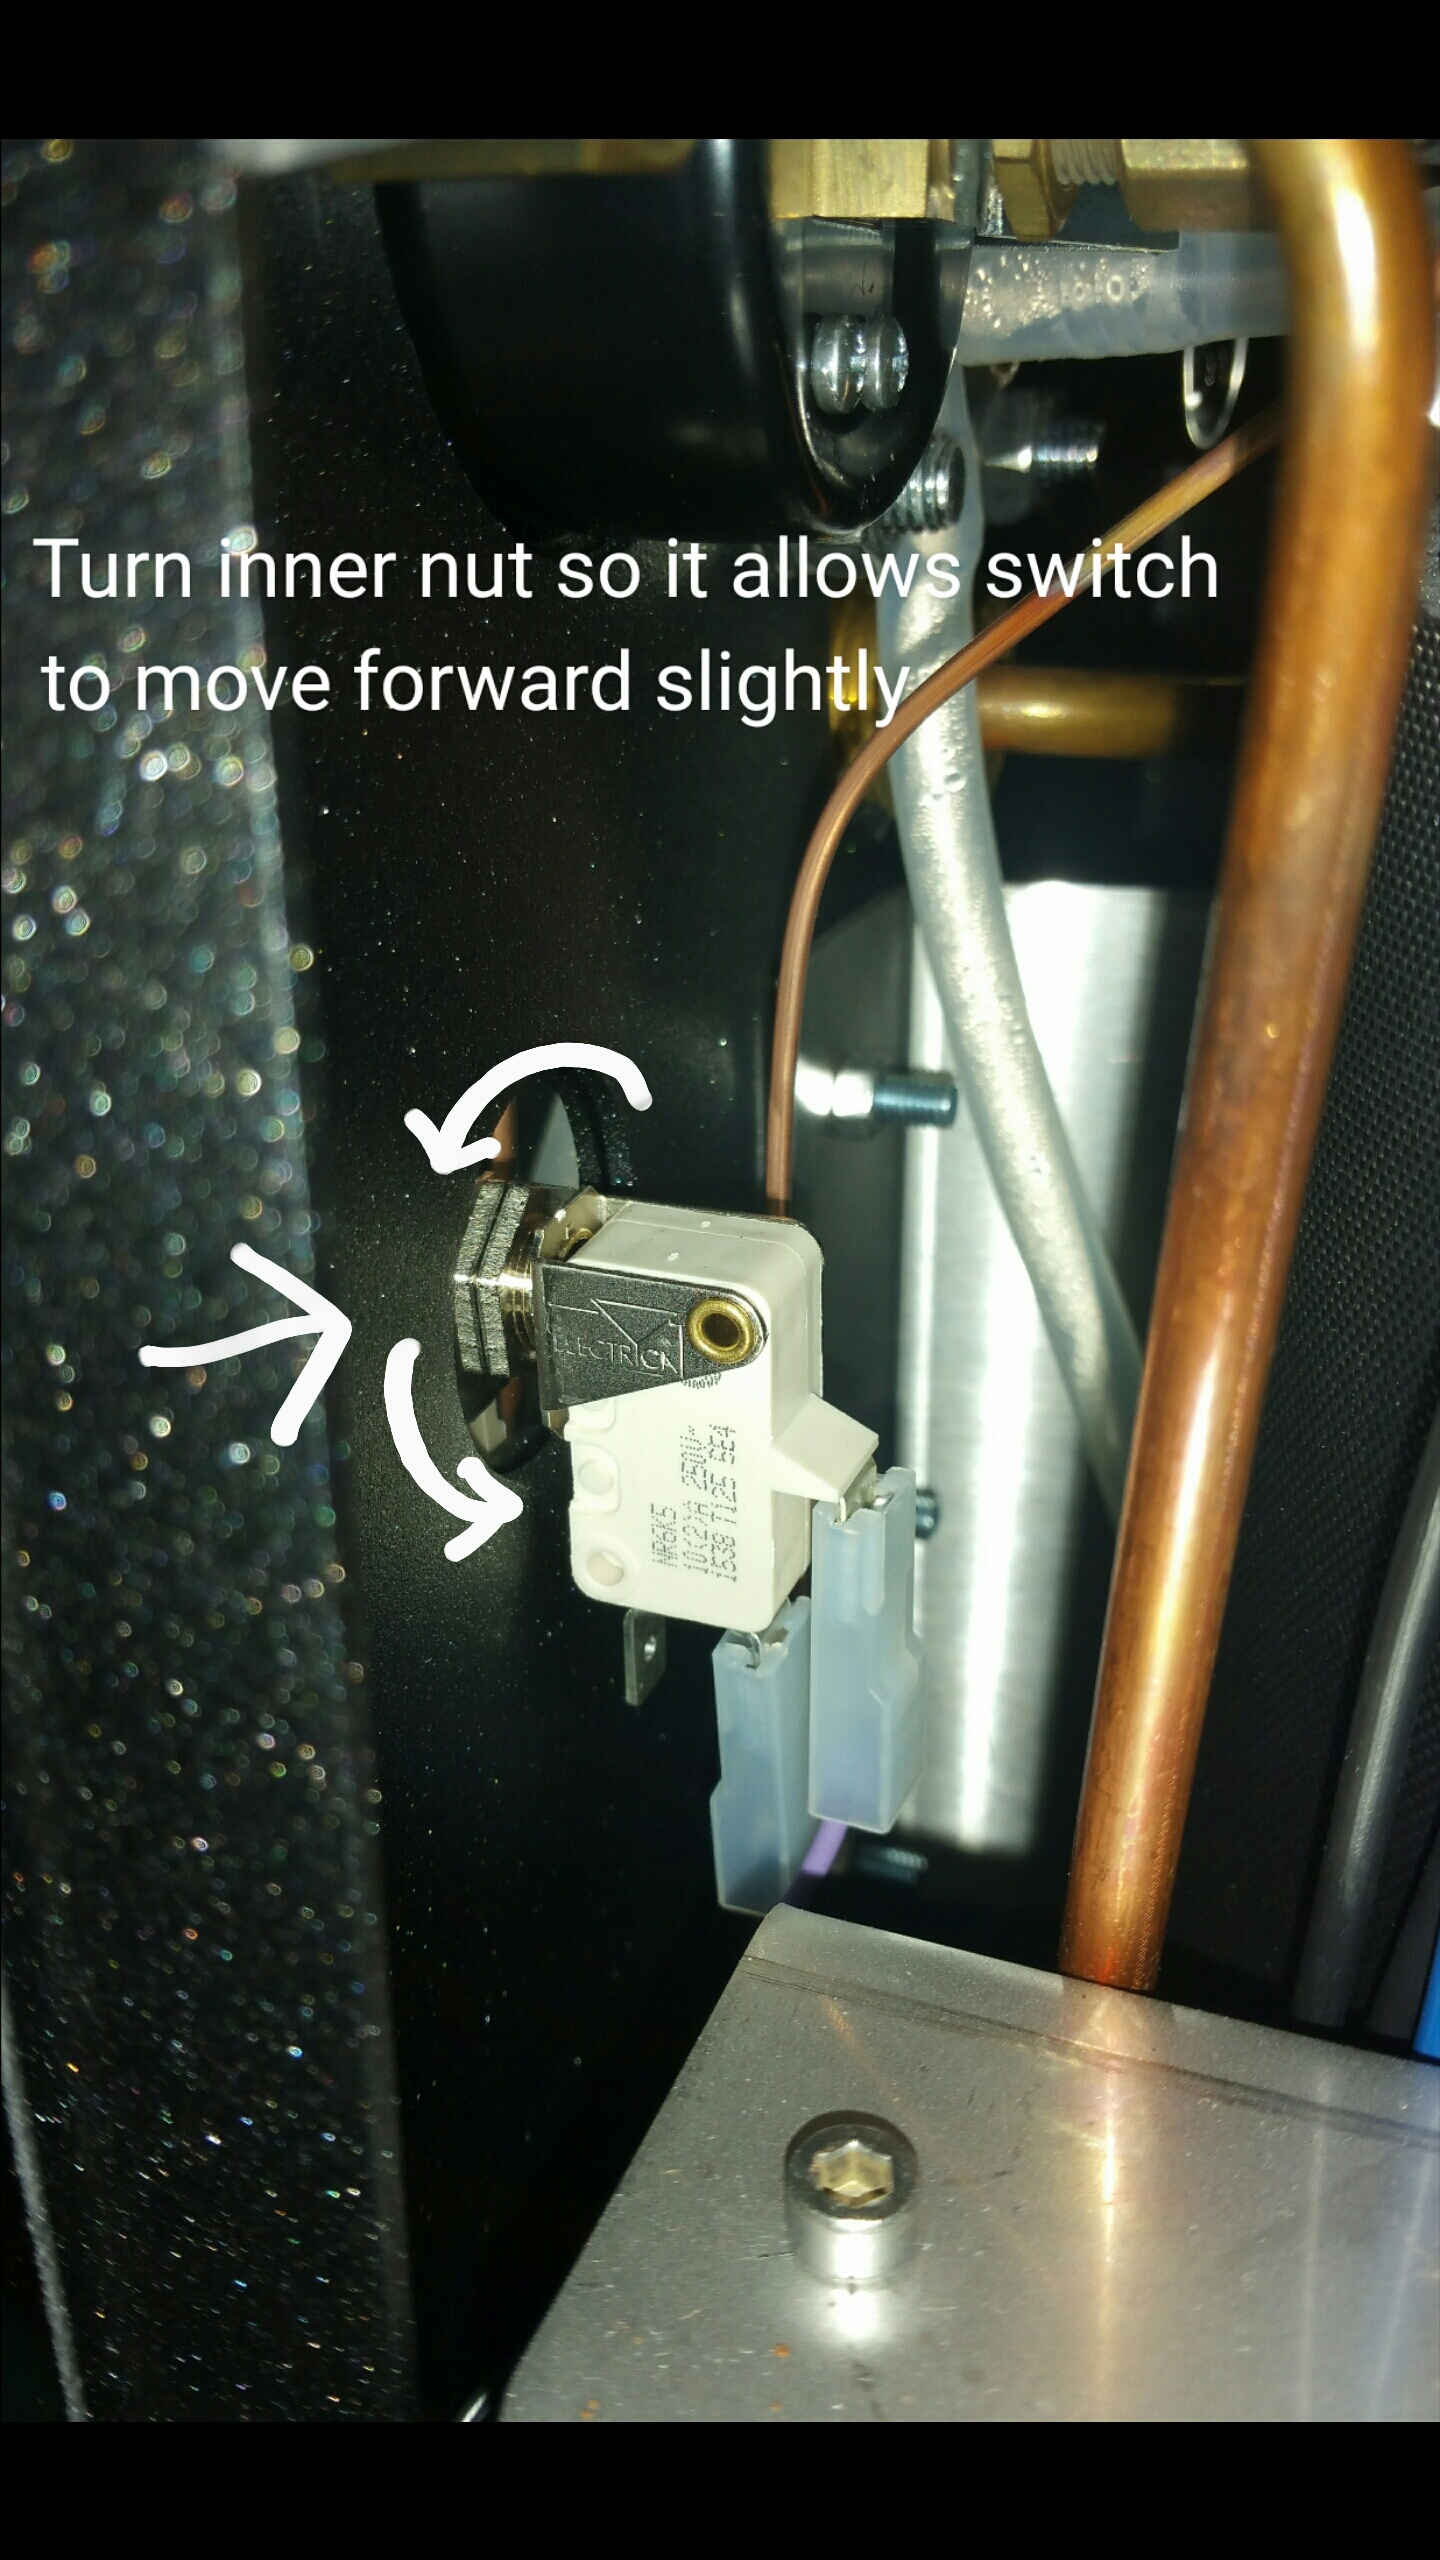 ECM Synchronika: Adjusting Pump Actuation Switch